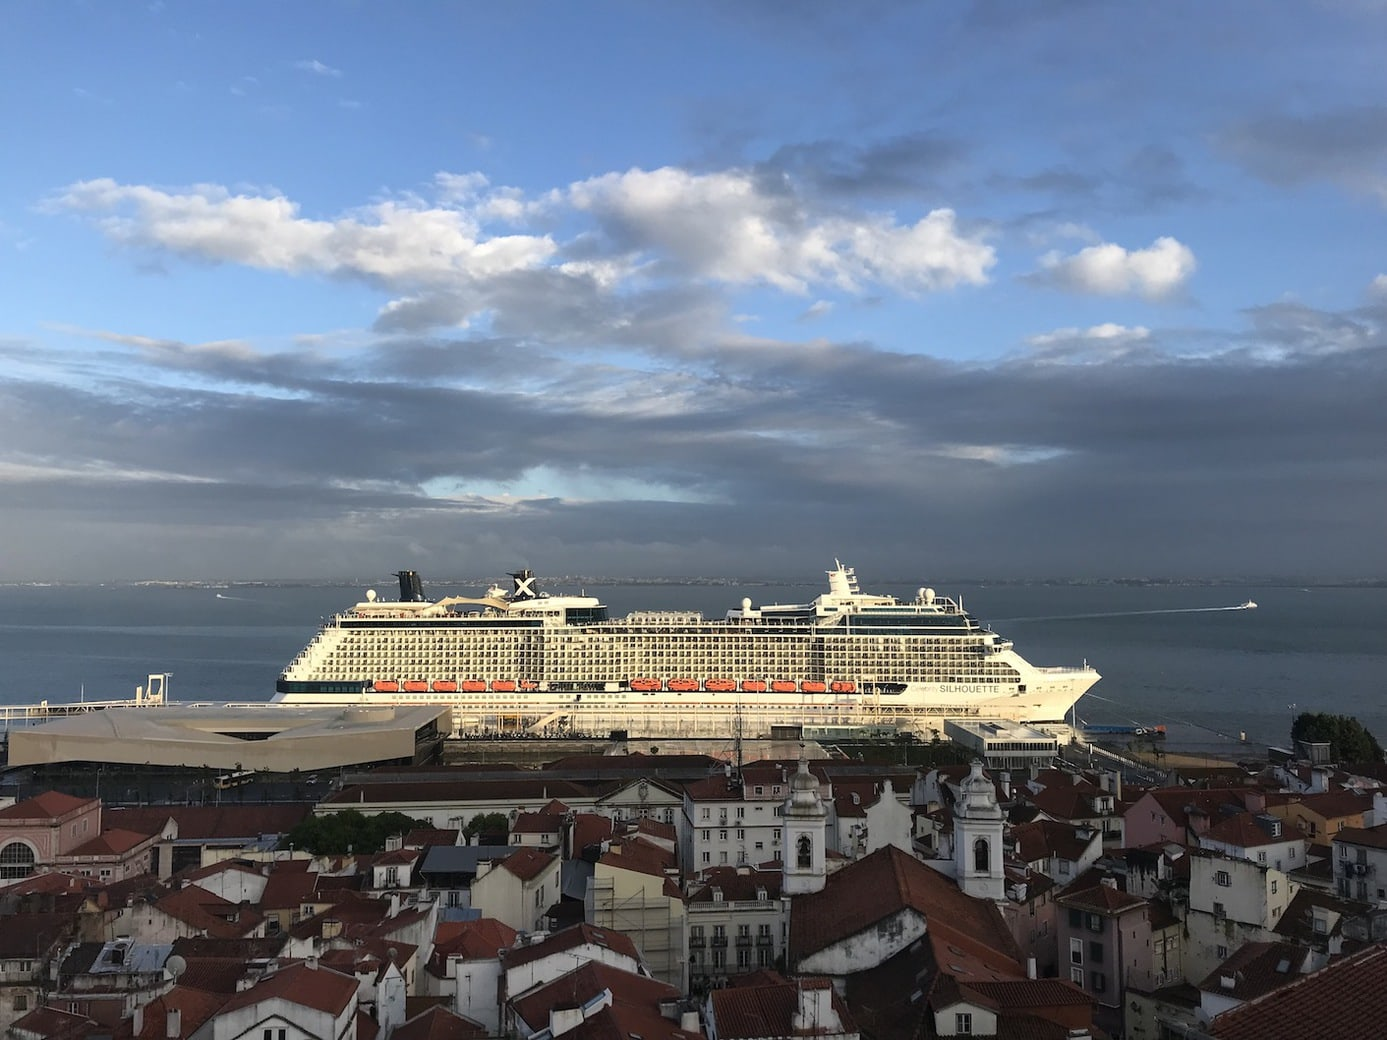 Celebrity Silhouette docked in Lisbon, Portugal